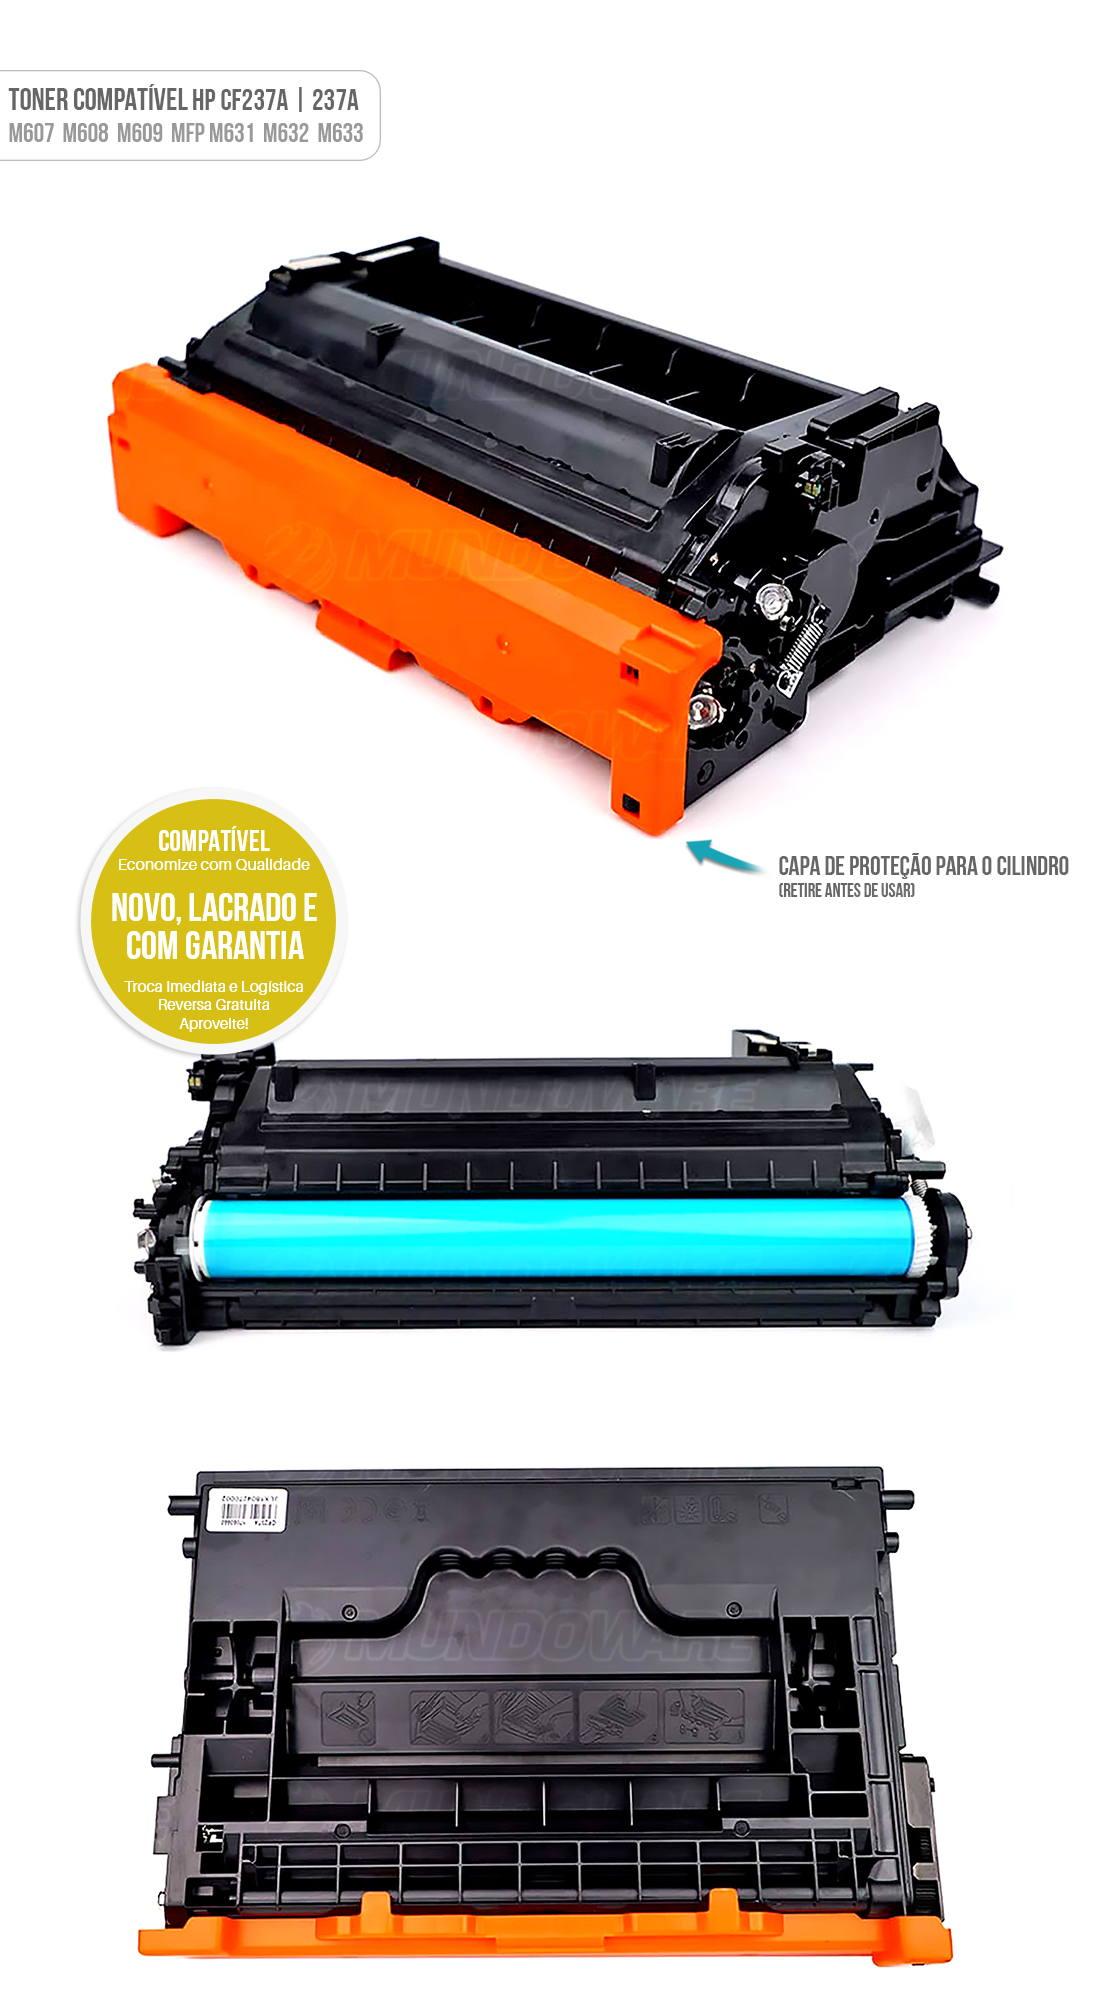 Toner Compatível modelo 237a cf237 cf237a para Impressora HP M607 M608 M609 MFP M631 M632 M633 M607dn M608dn M609dn Preto 11000 Tonner